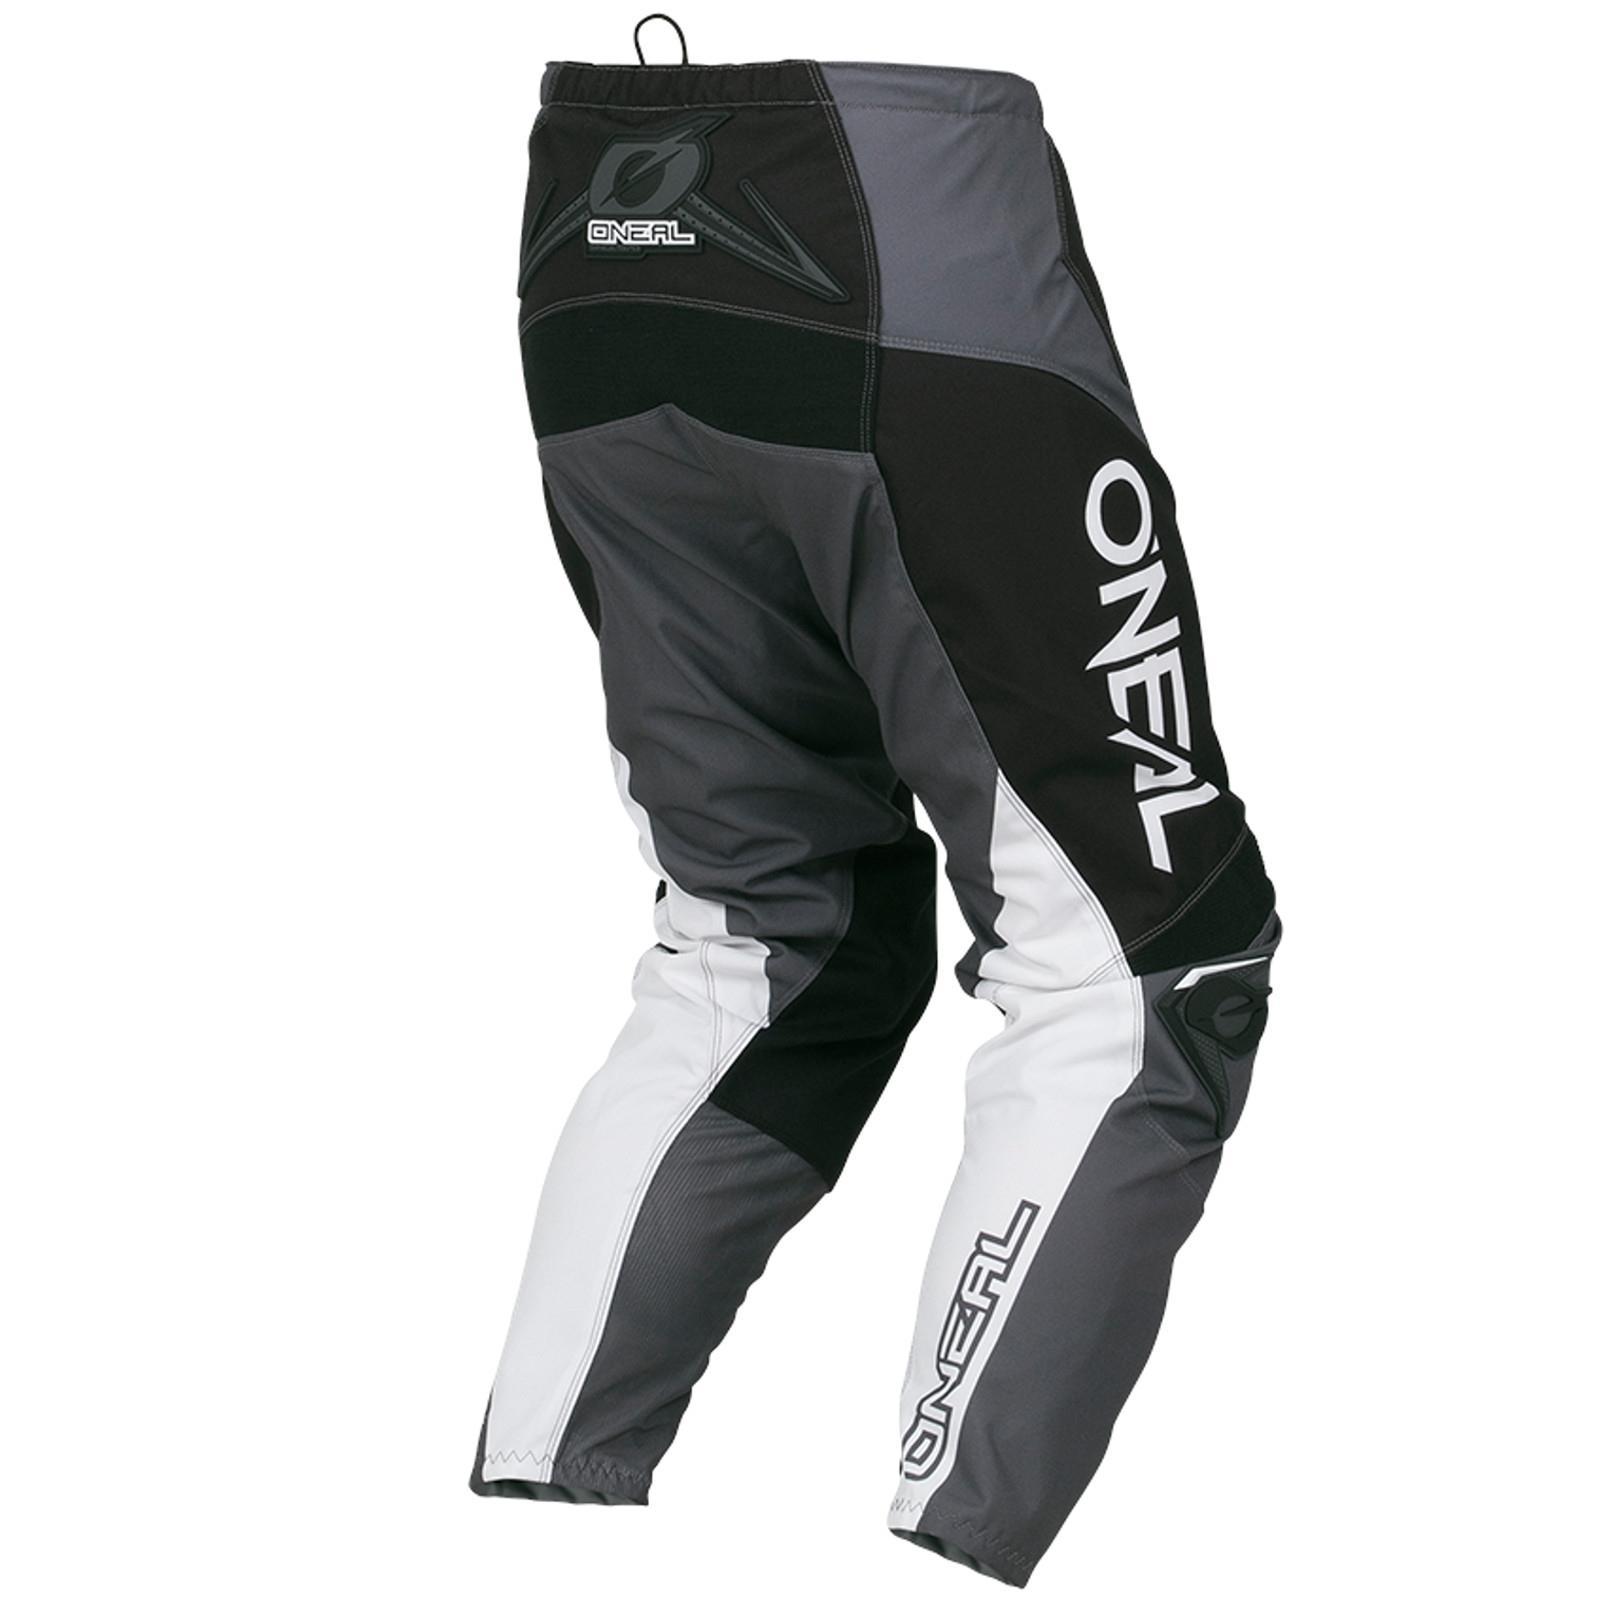 Oneal-elemento-Mayhem-Hardwear-Pants-pantalones-MX-DH-FR-Moto-Cross-Enduro-MTB-moto miniatura 49